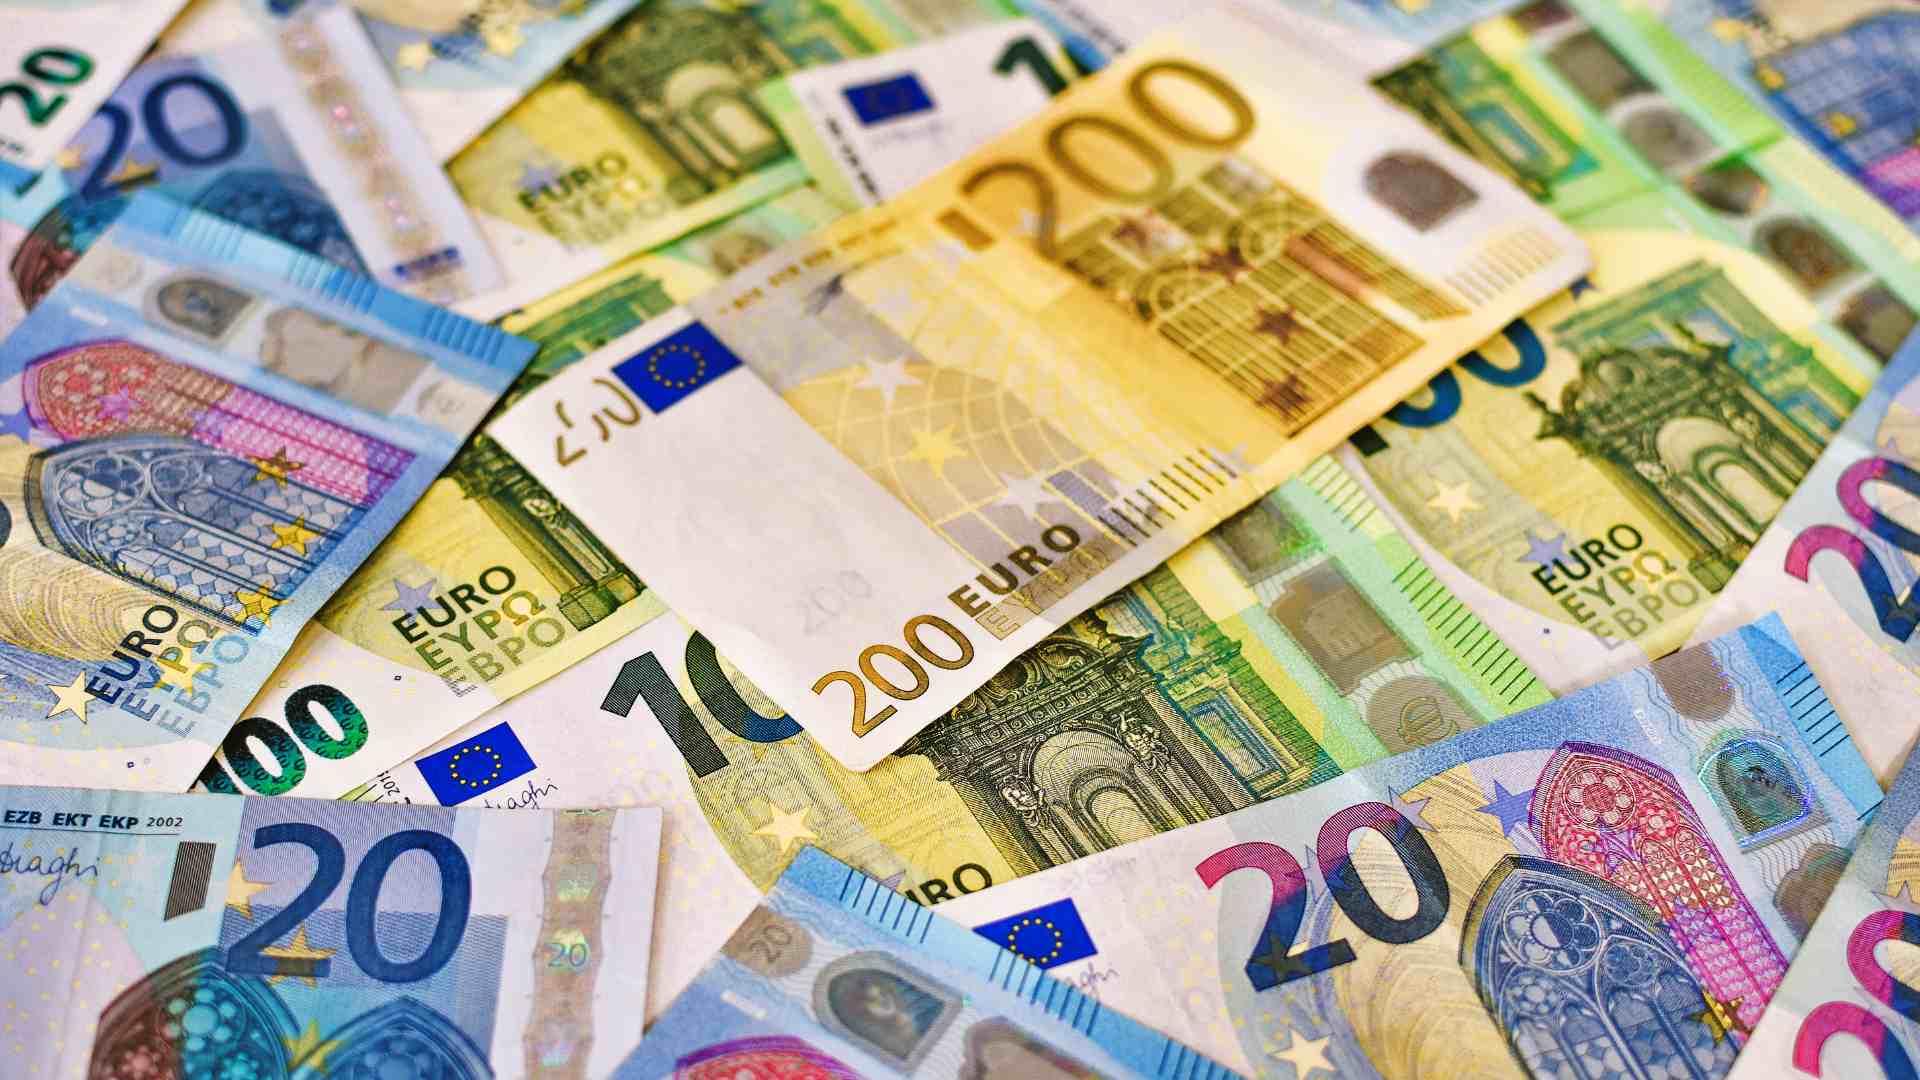 kozossegi-finanszirozas-crowdfunding-eu-szabalyozas-mnb